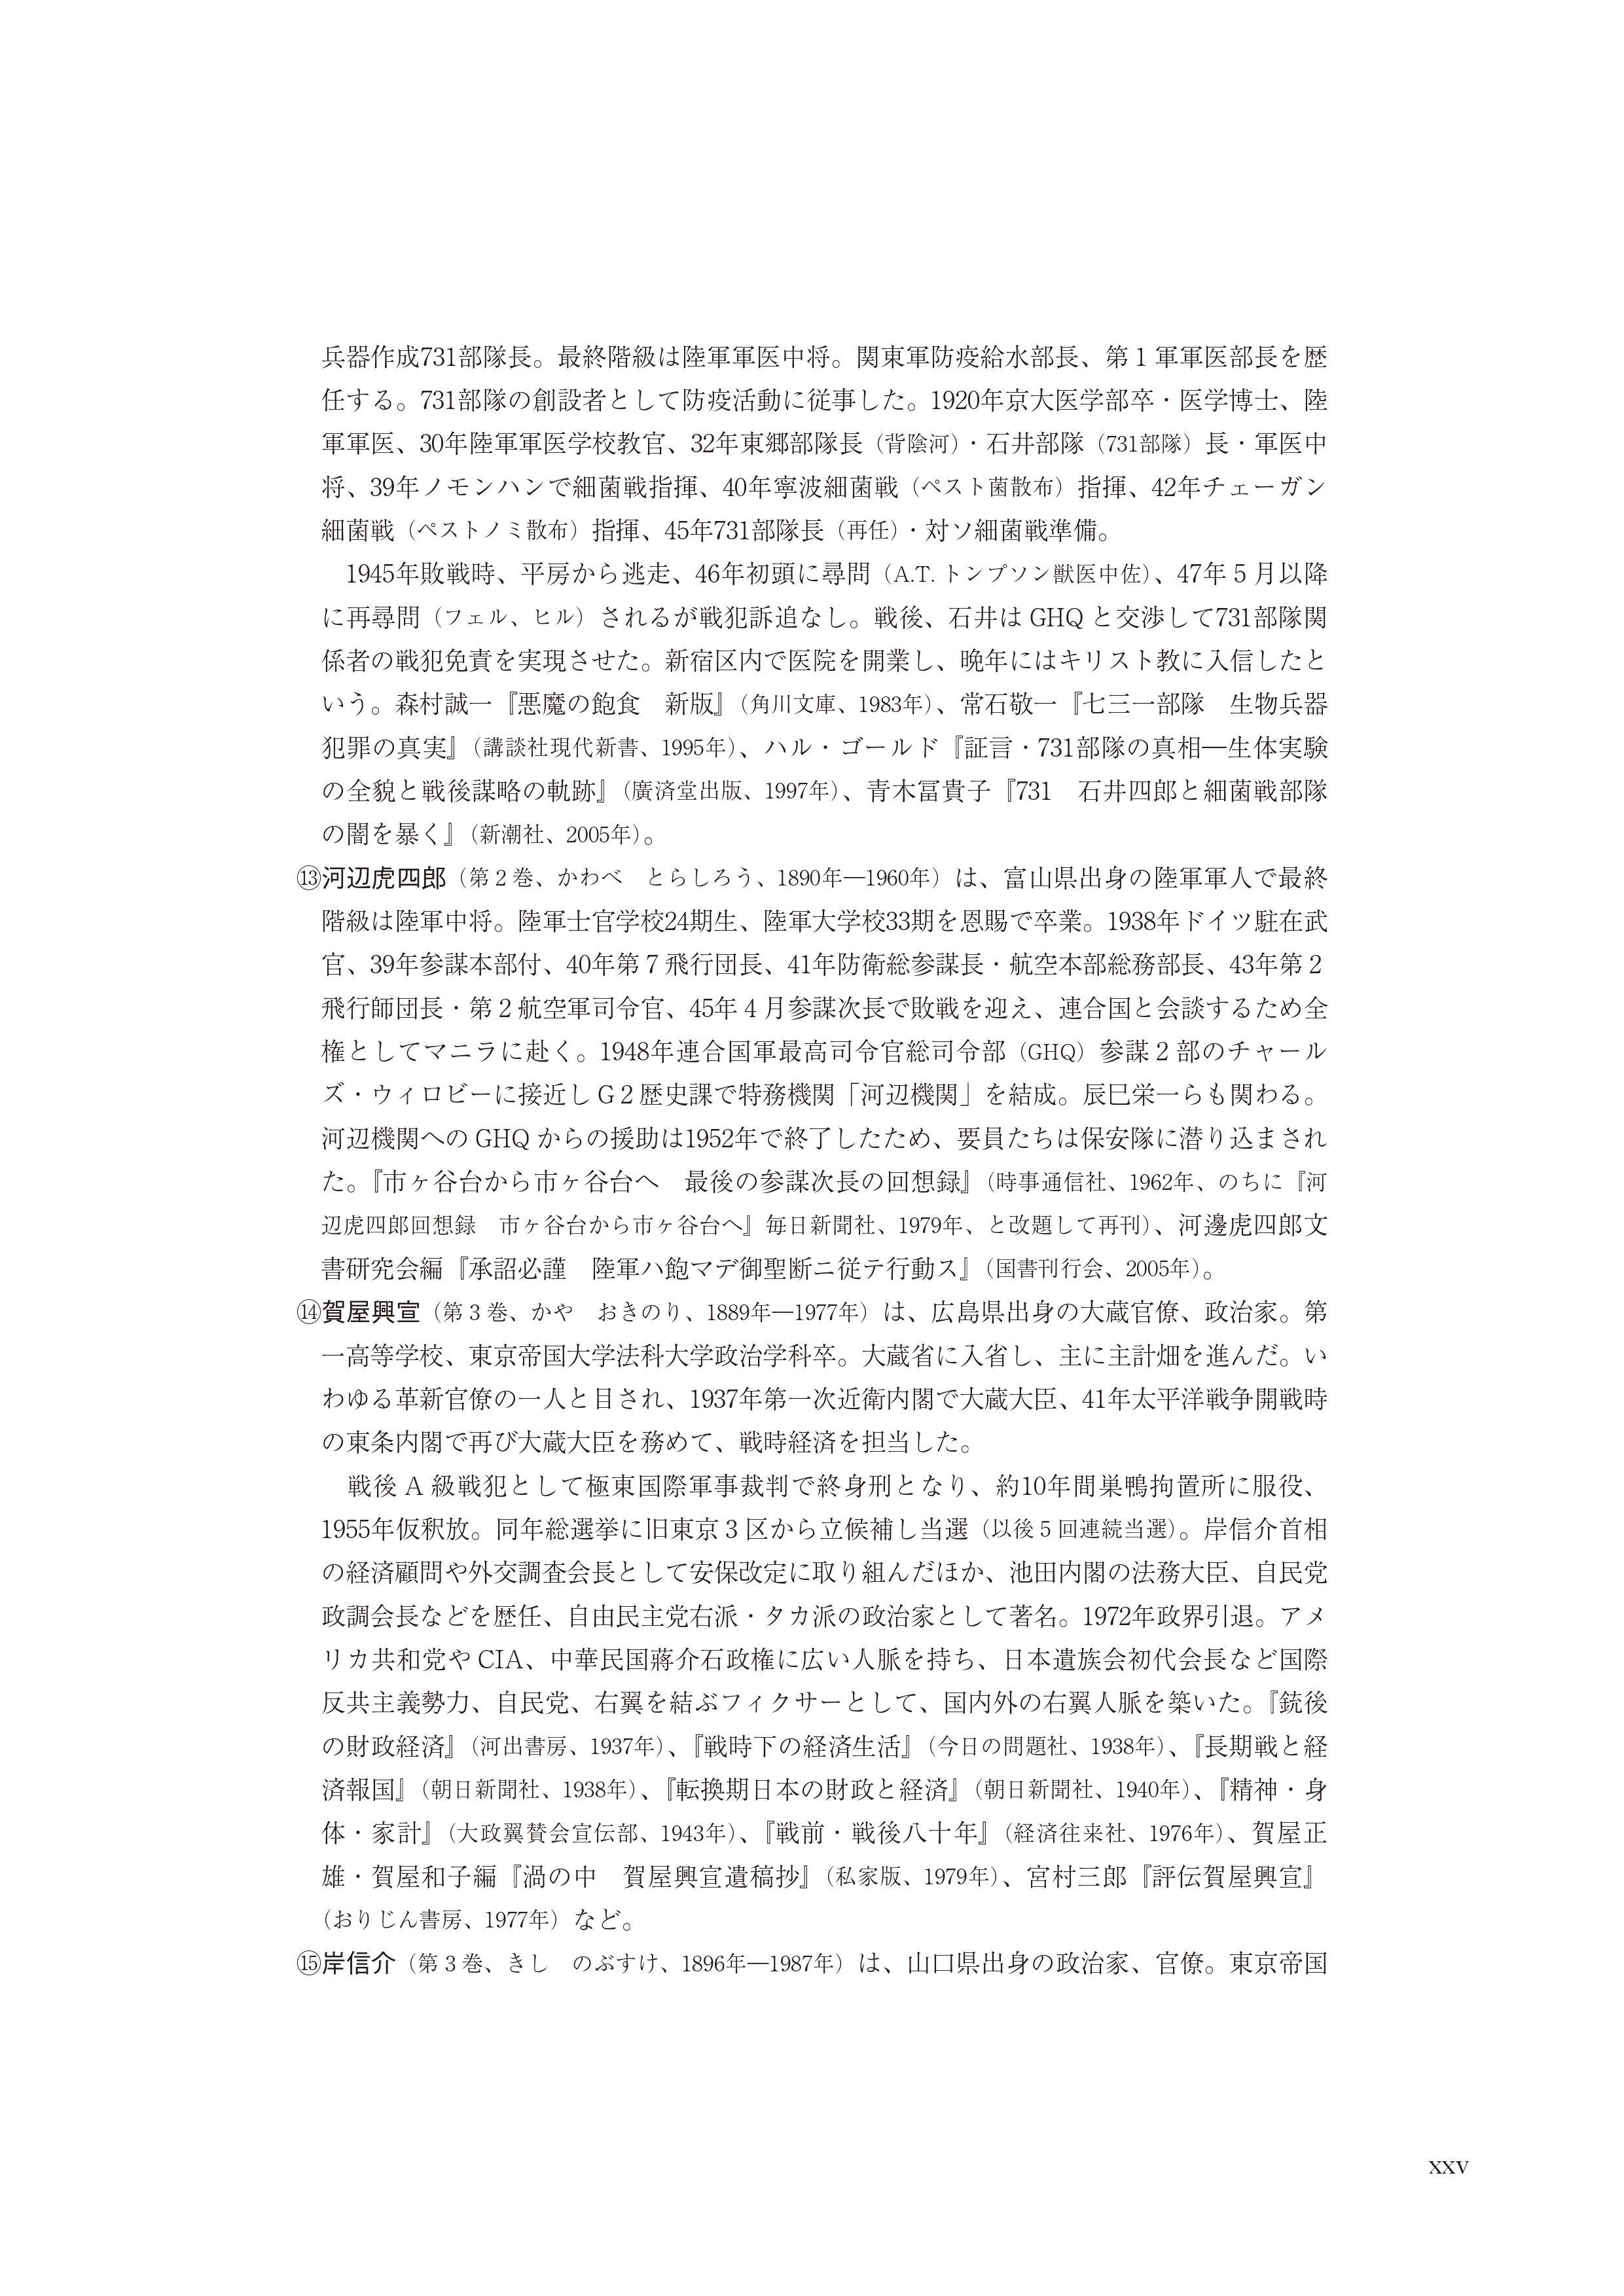 CIA日本人ファイル0001 (25)